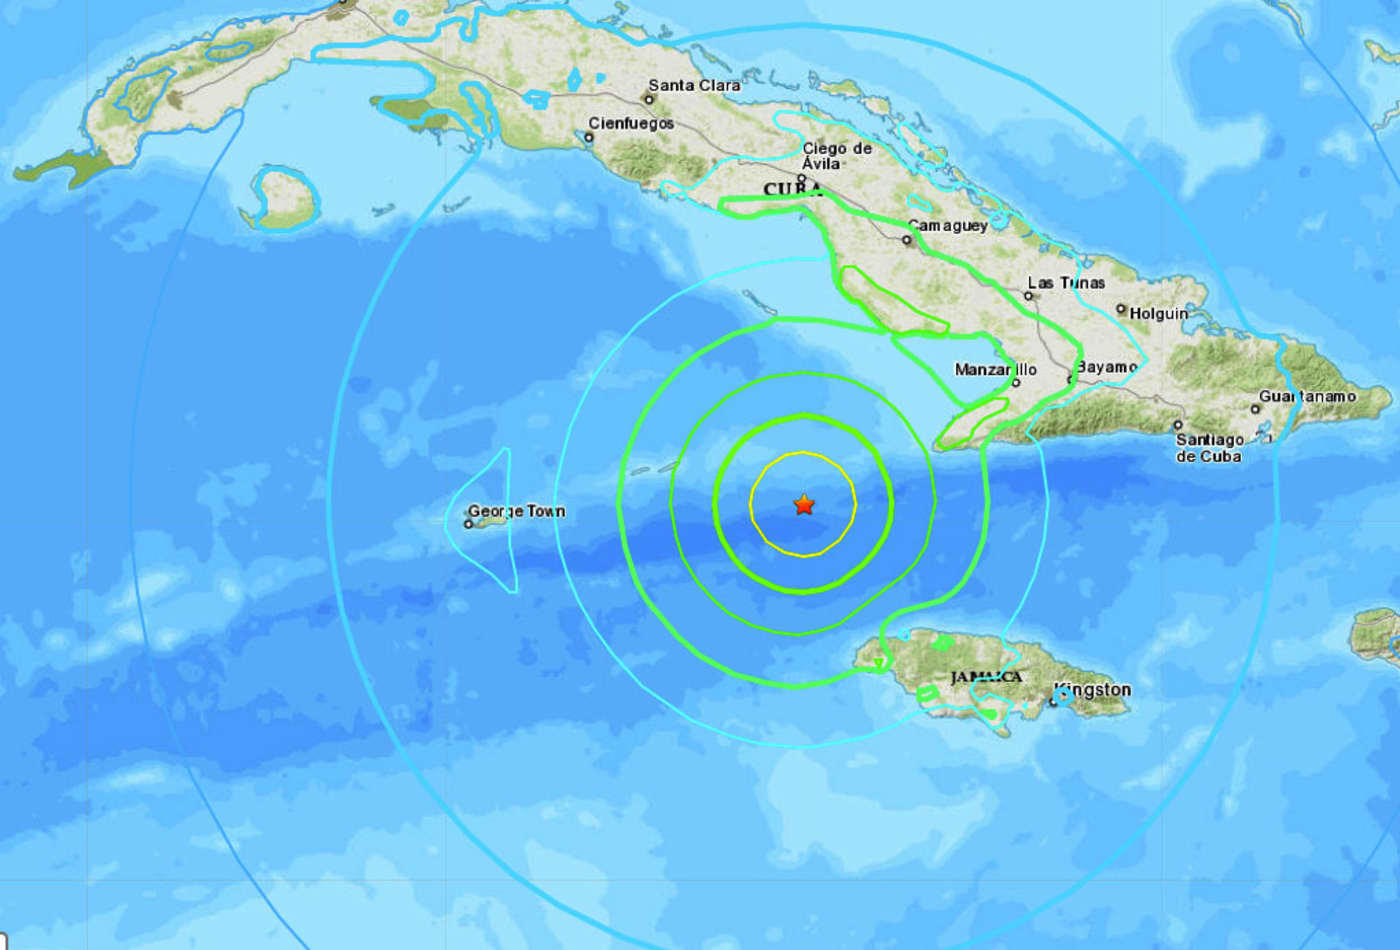 Powerful 7.7 magnitude earthquake strikes between Cuba and Jamaica